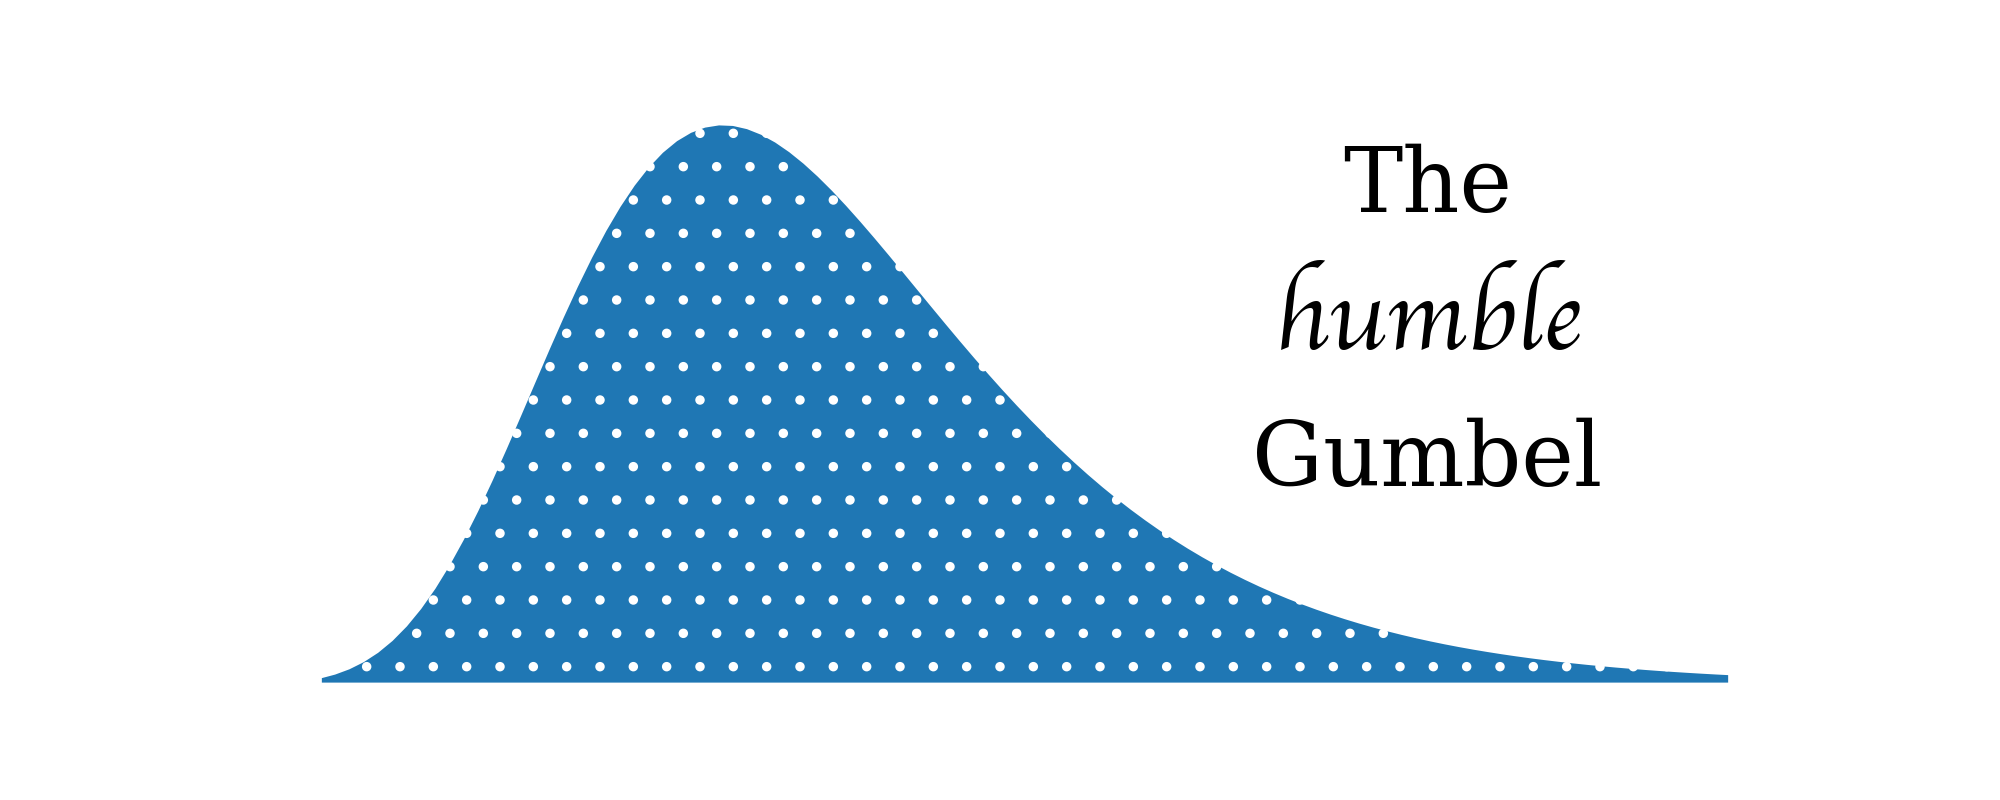 The Humble Gumbel Distribution